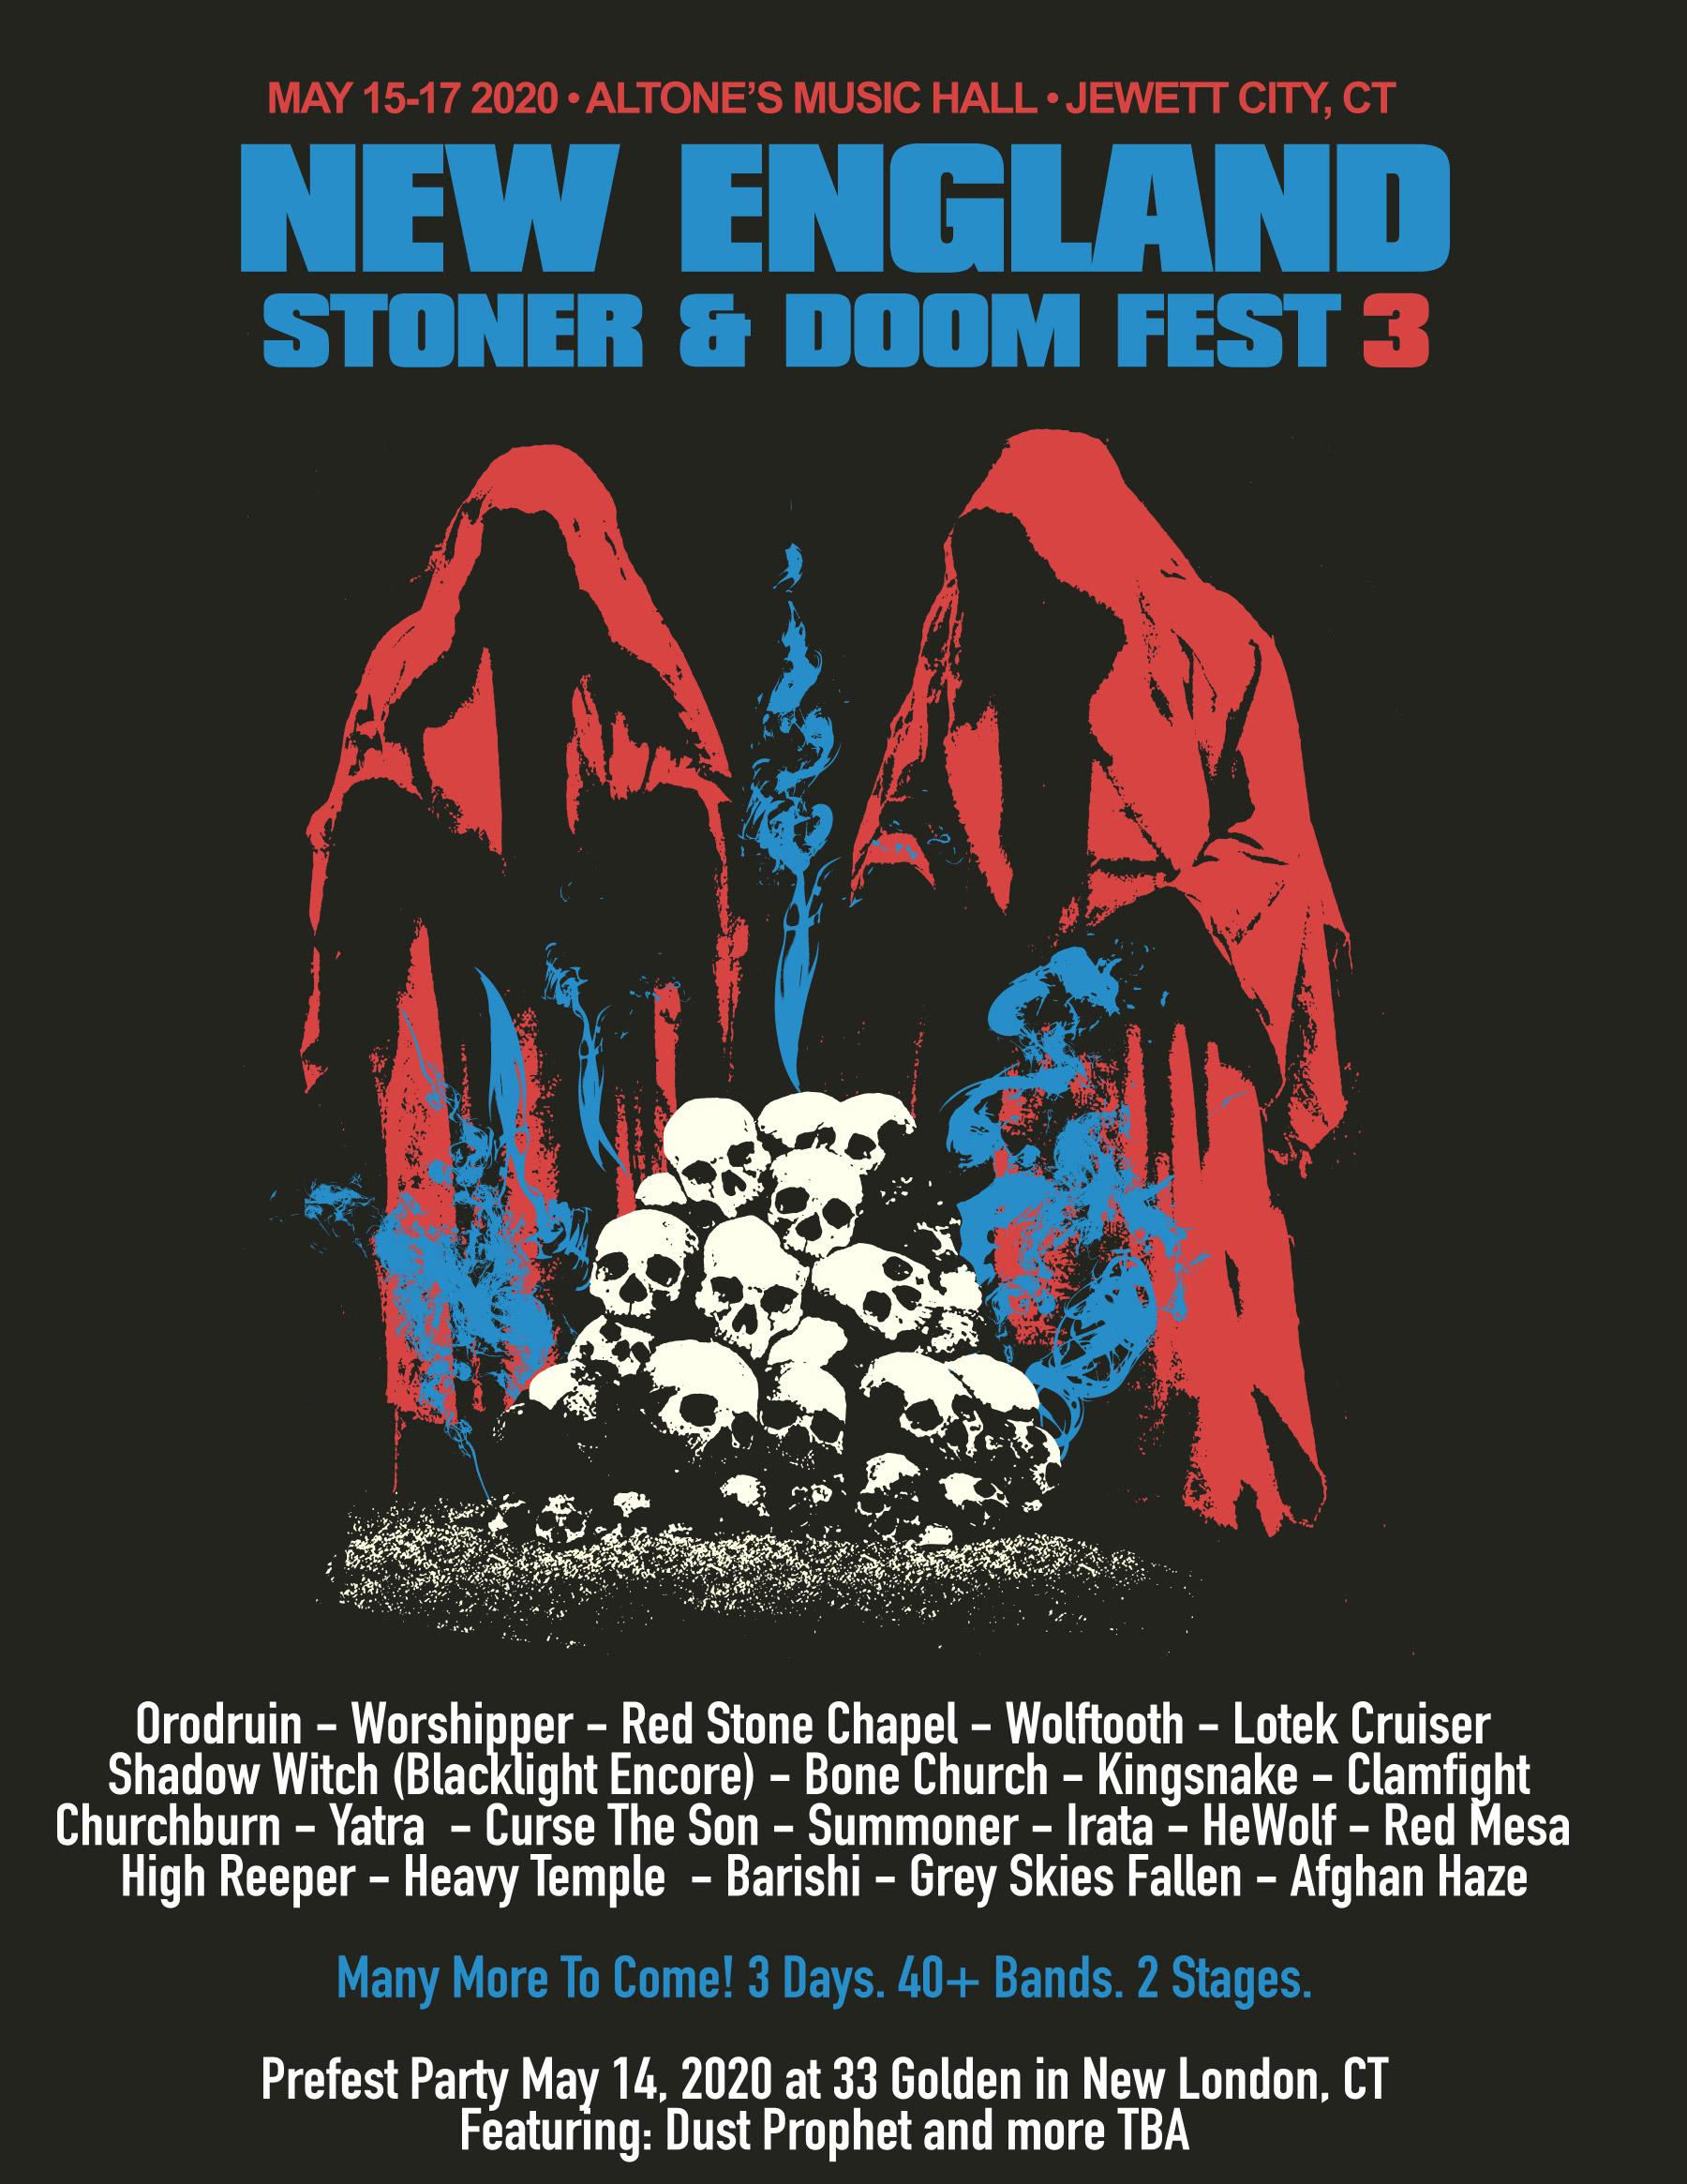 new-england-stoner-and-doom-fest-3-new-poster